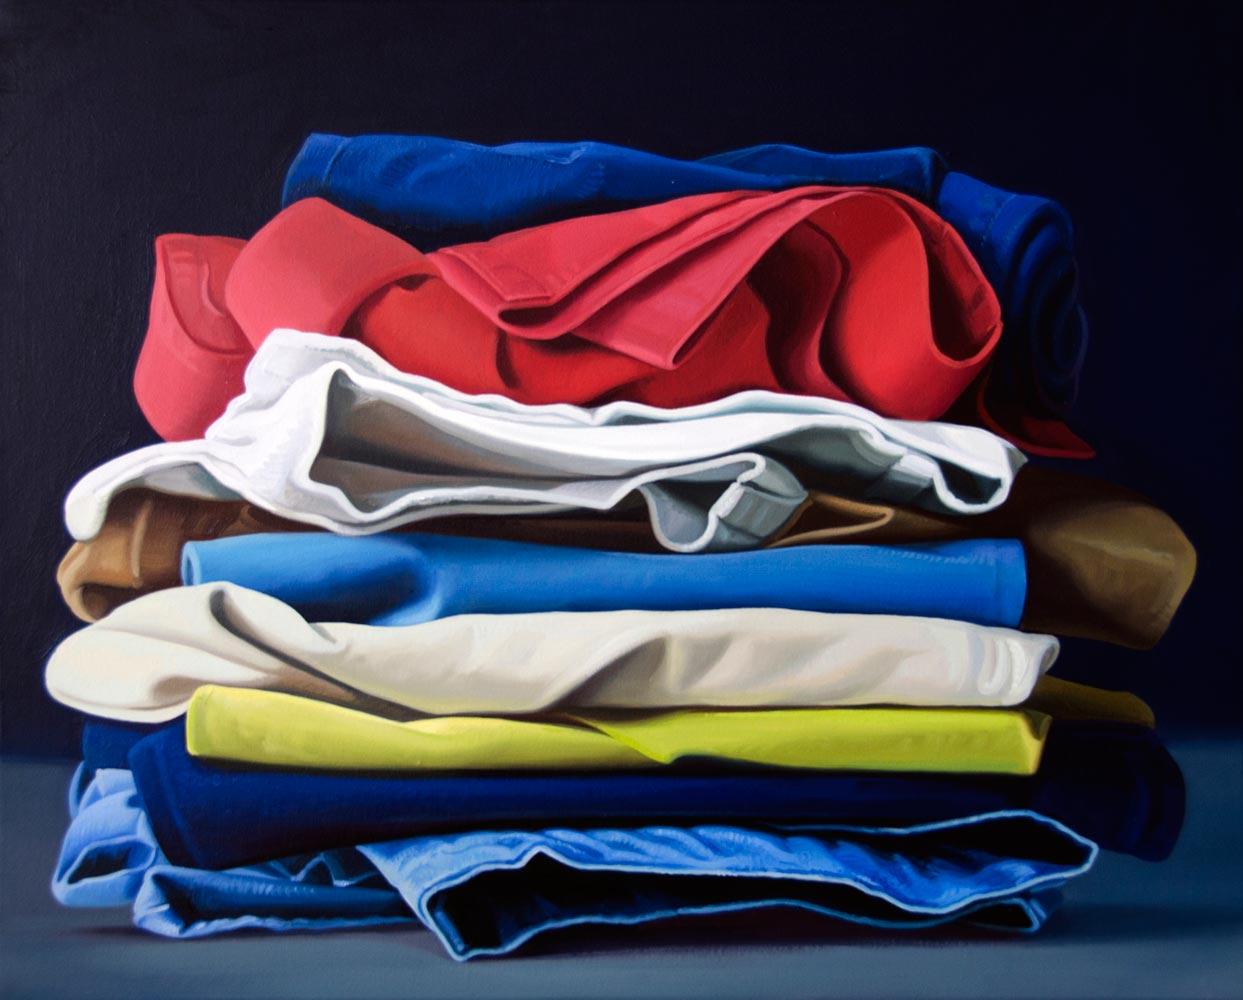 MAGNANI ALBERTO, Pila di Jeans, 2018, olio su tela, 40 x 50 cm.jpg